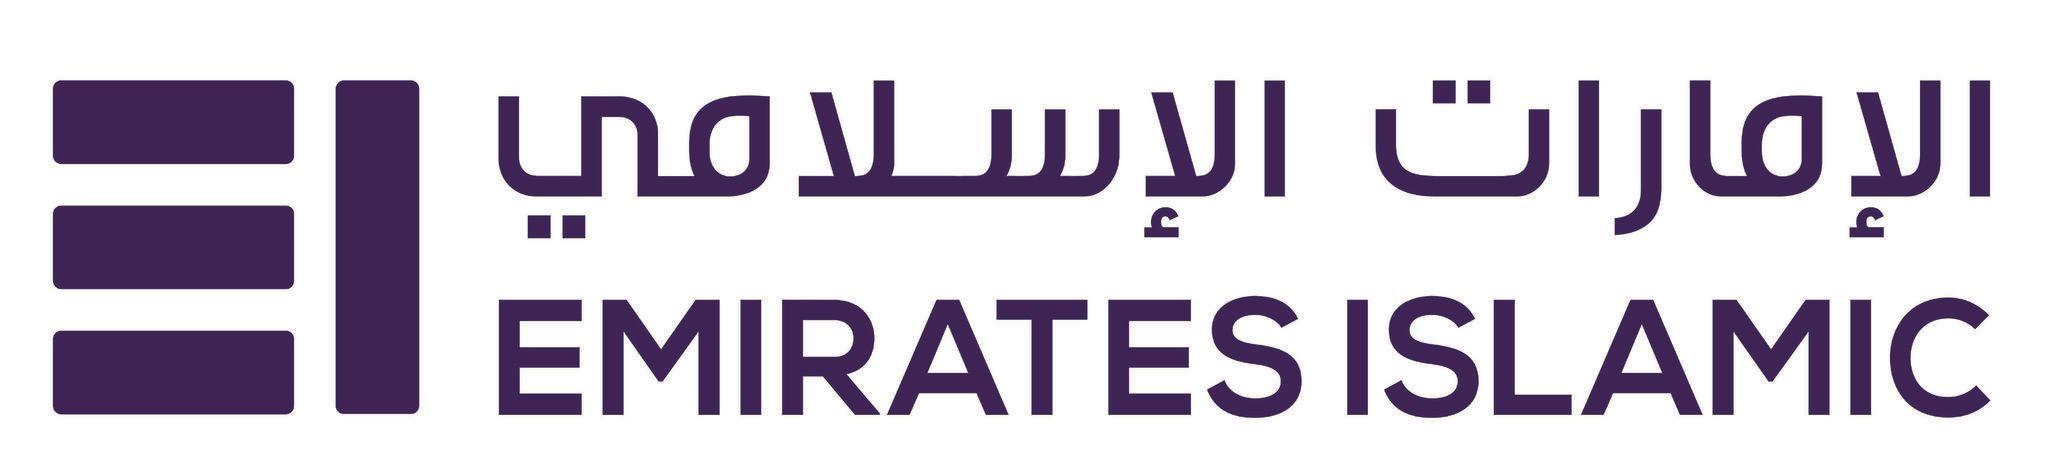 Emirates Islamic Bank Eib Exhibitors Careers Uae